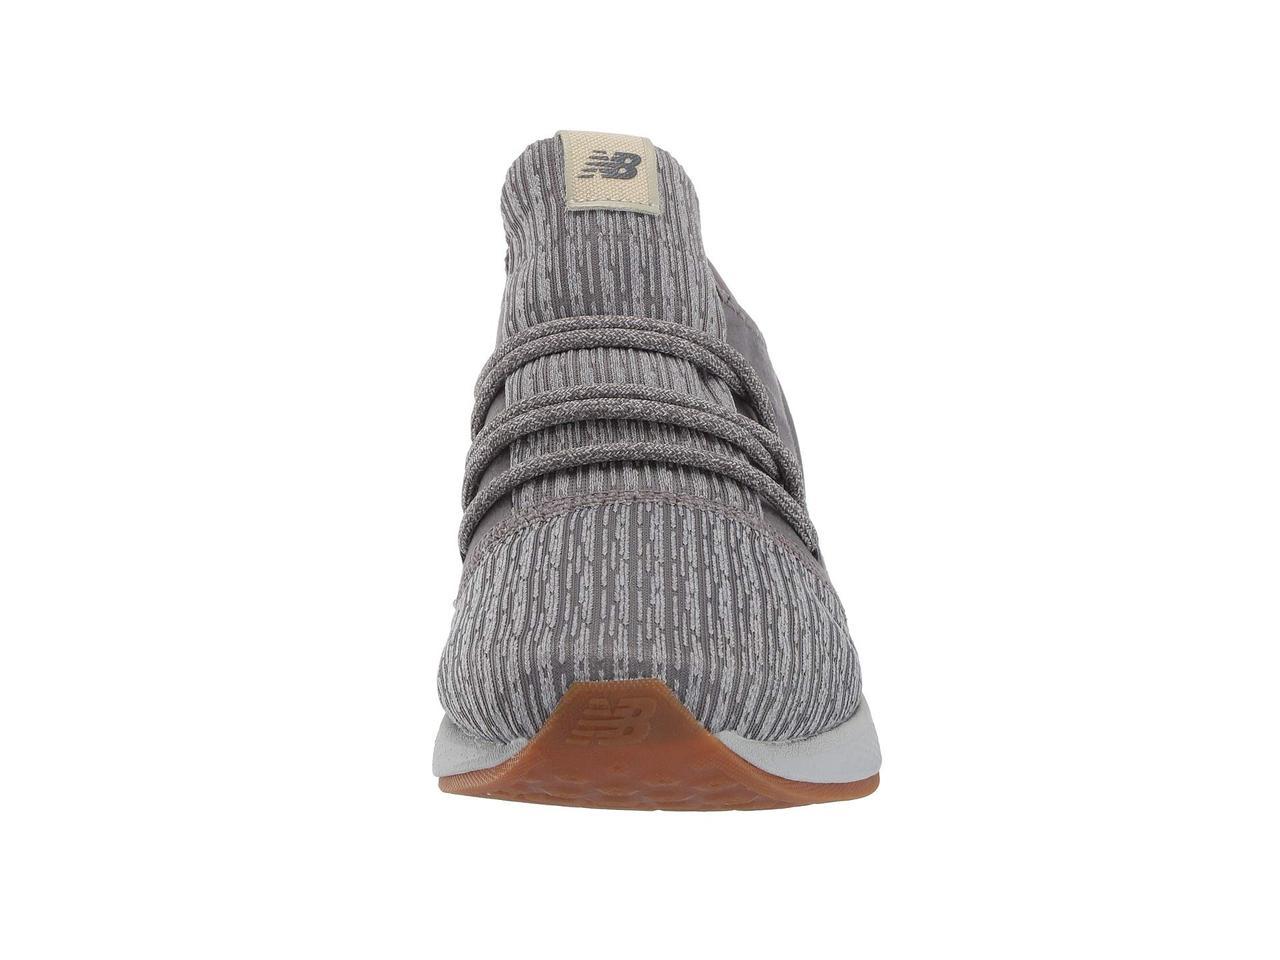 separation shoes c732b e57f9 ... Кроссовки Кеды (Оригинал) New Balance Fresh Foam Cruz v2 Decon  Castlerock Rain